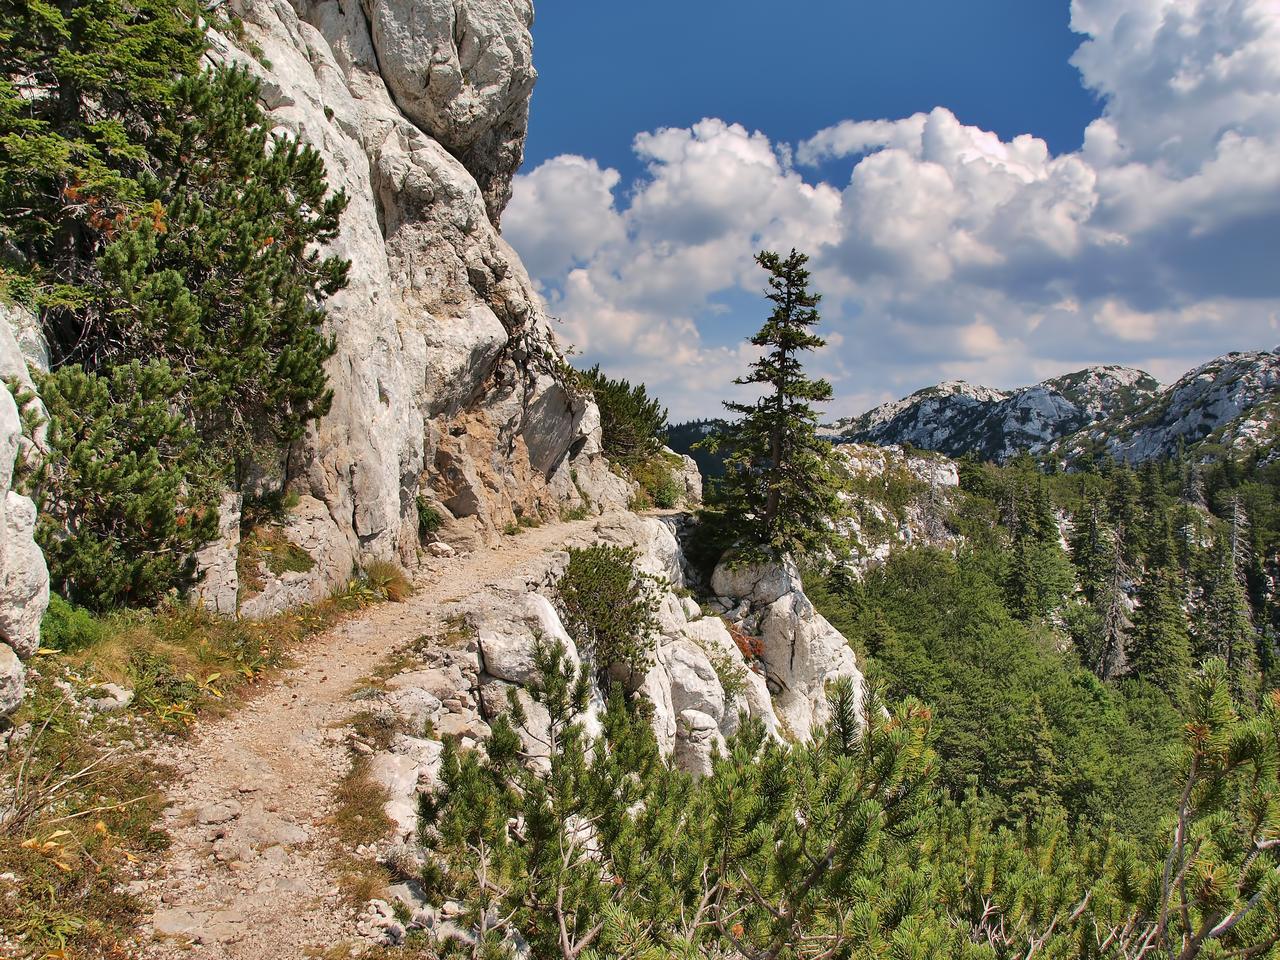 Velebit mountain scenery